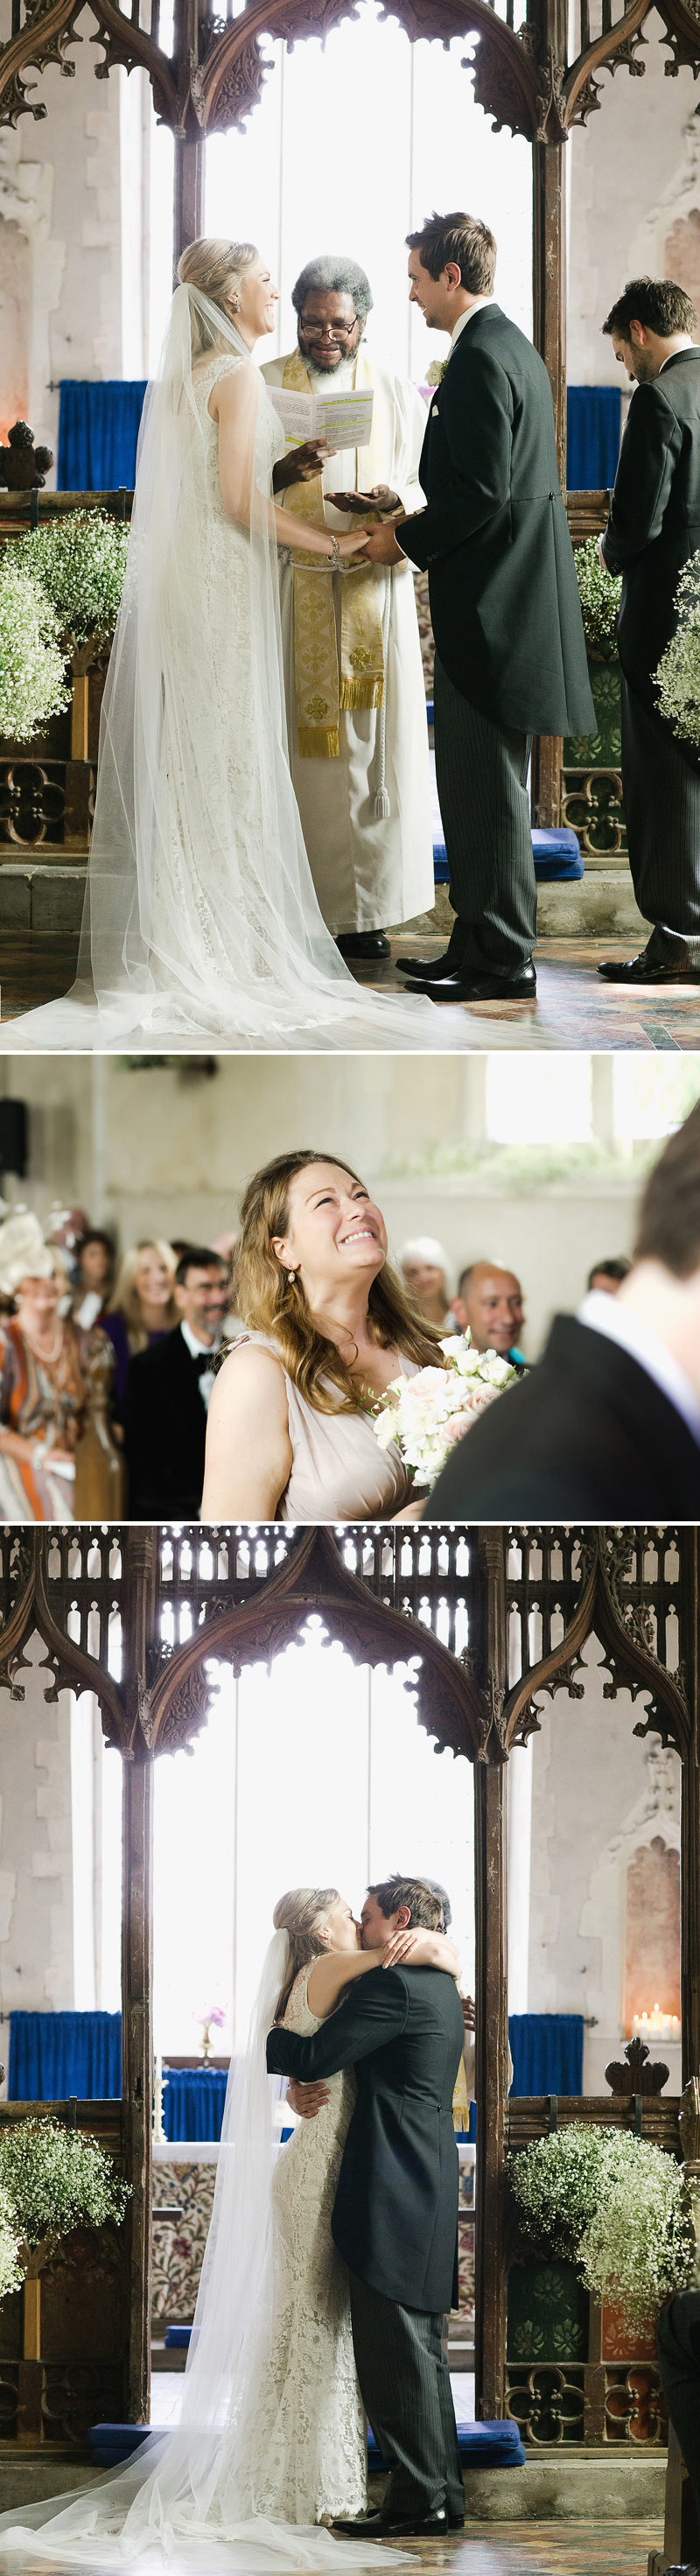 Forever And Ever, Amen. - ROCK MY WEDDING | UK WEDDING BLOG & DIRECTORY